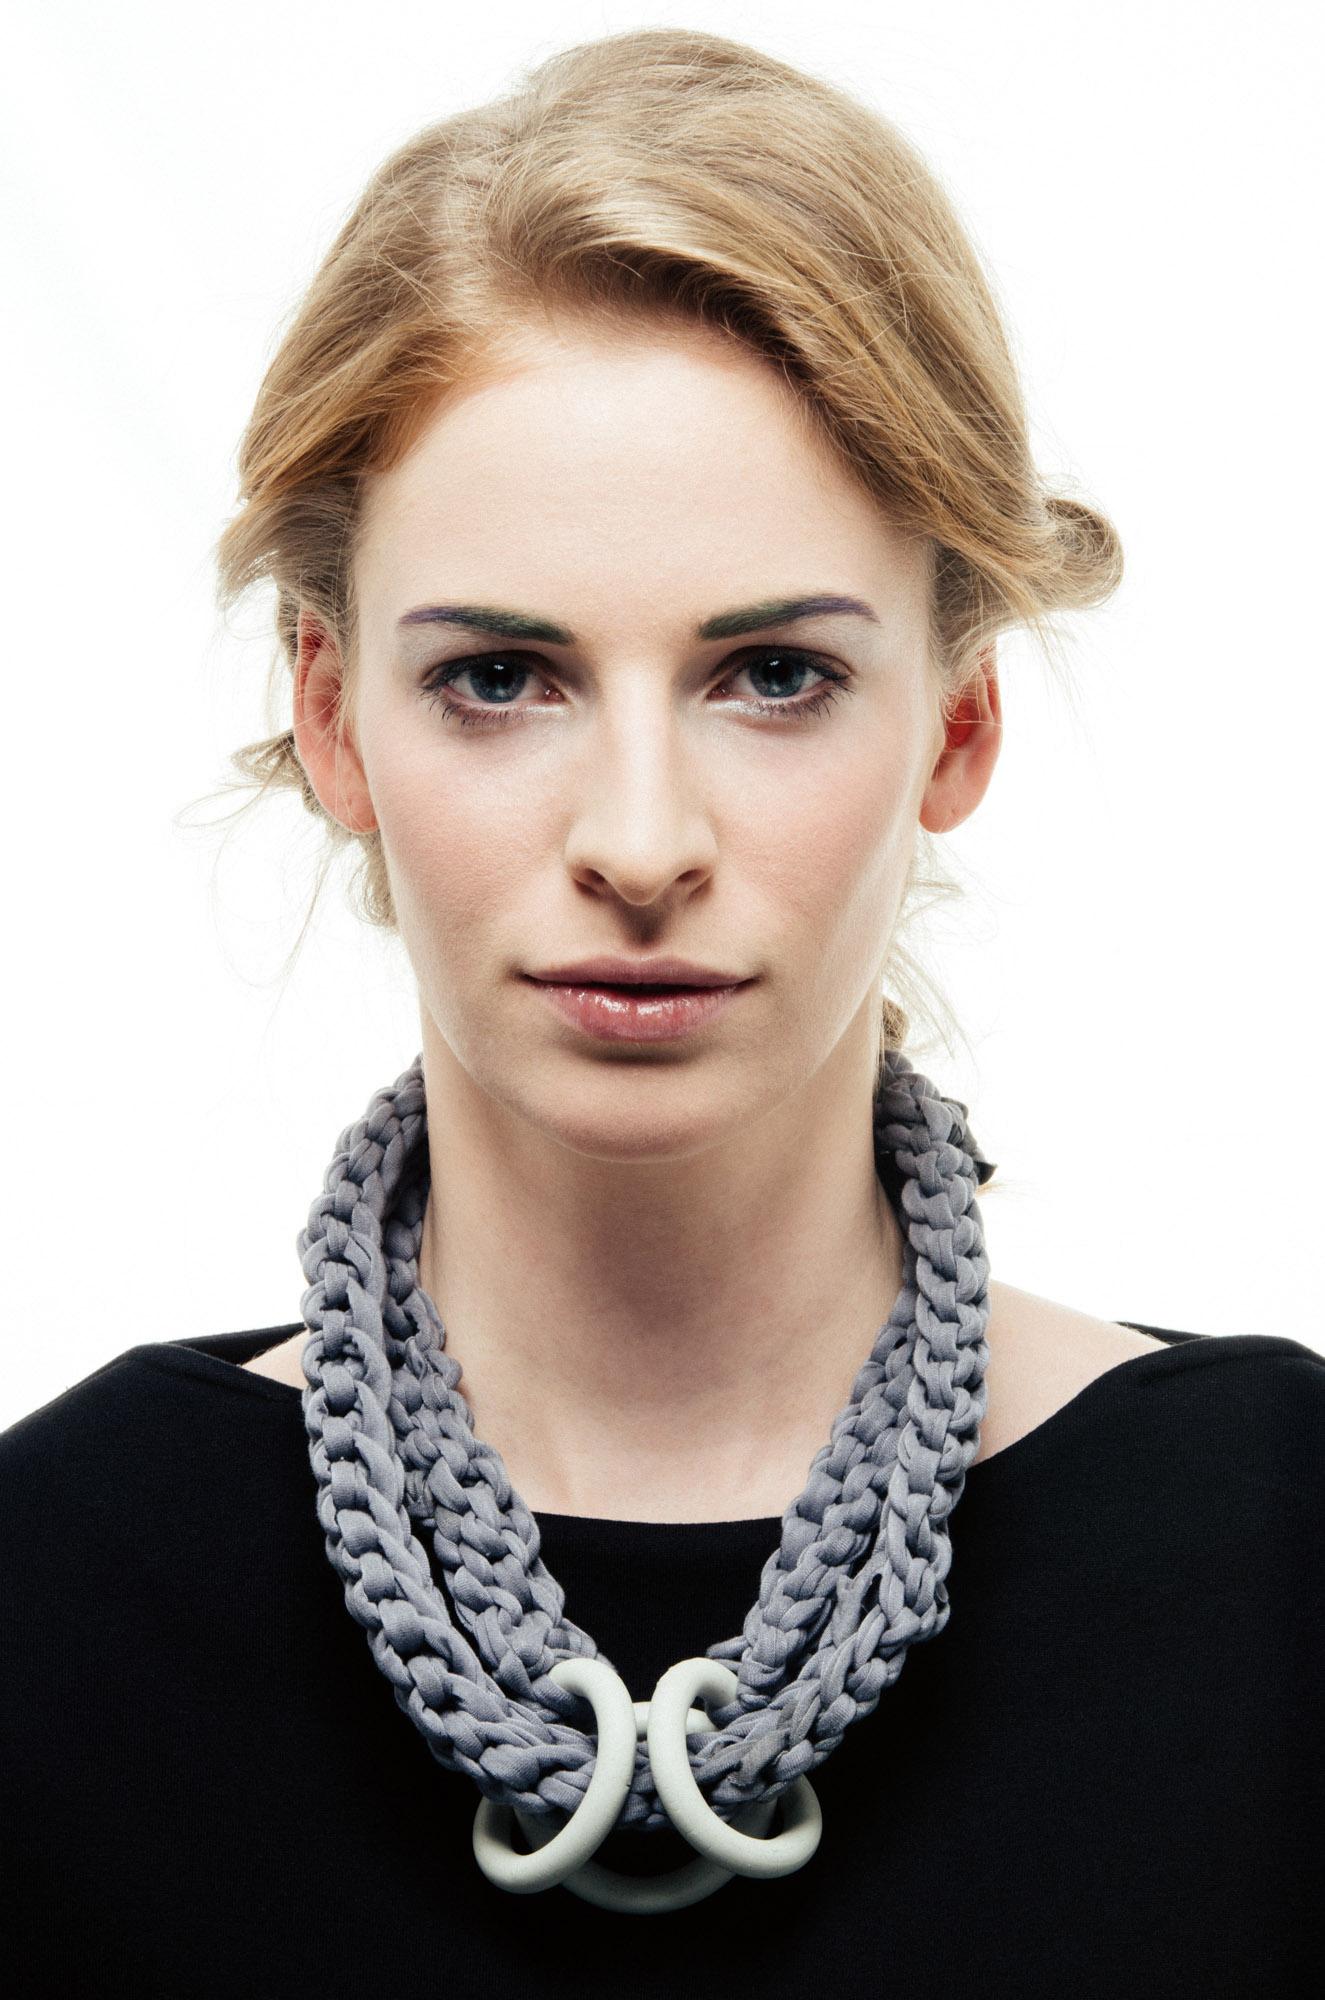 Bocco necklace by Anna Borshi 03.jpg